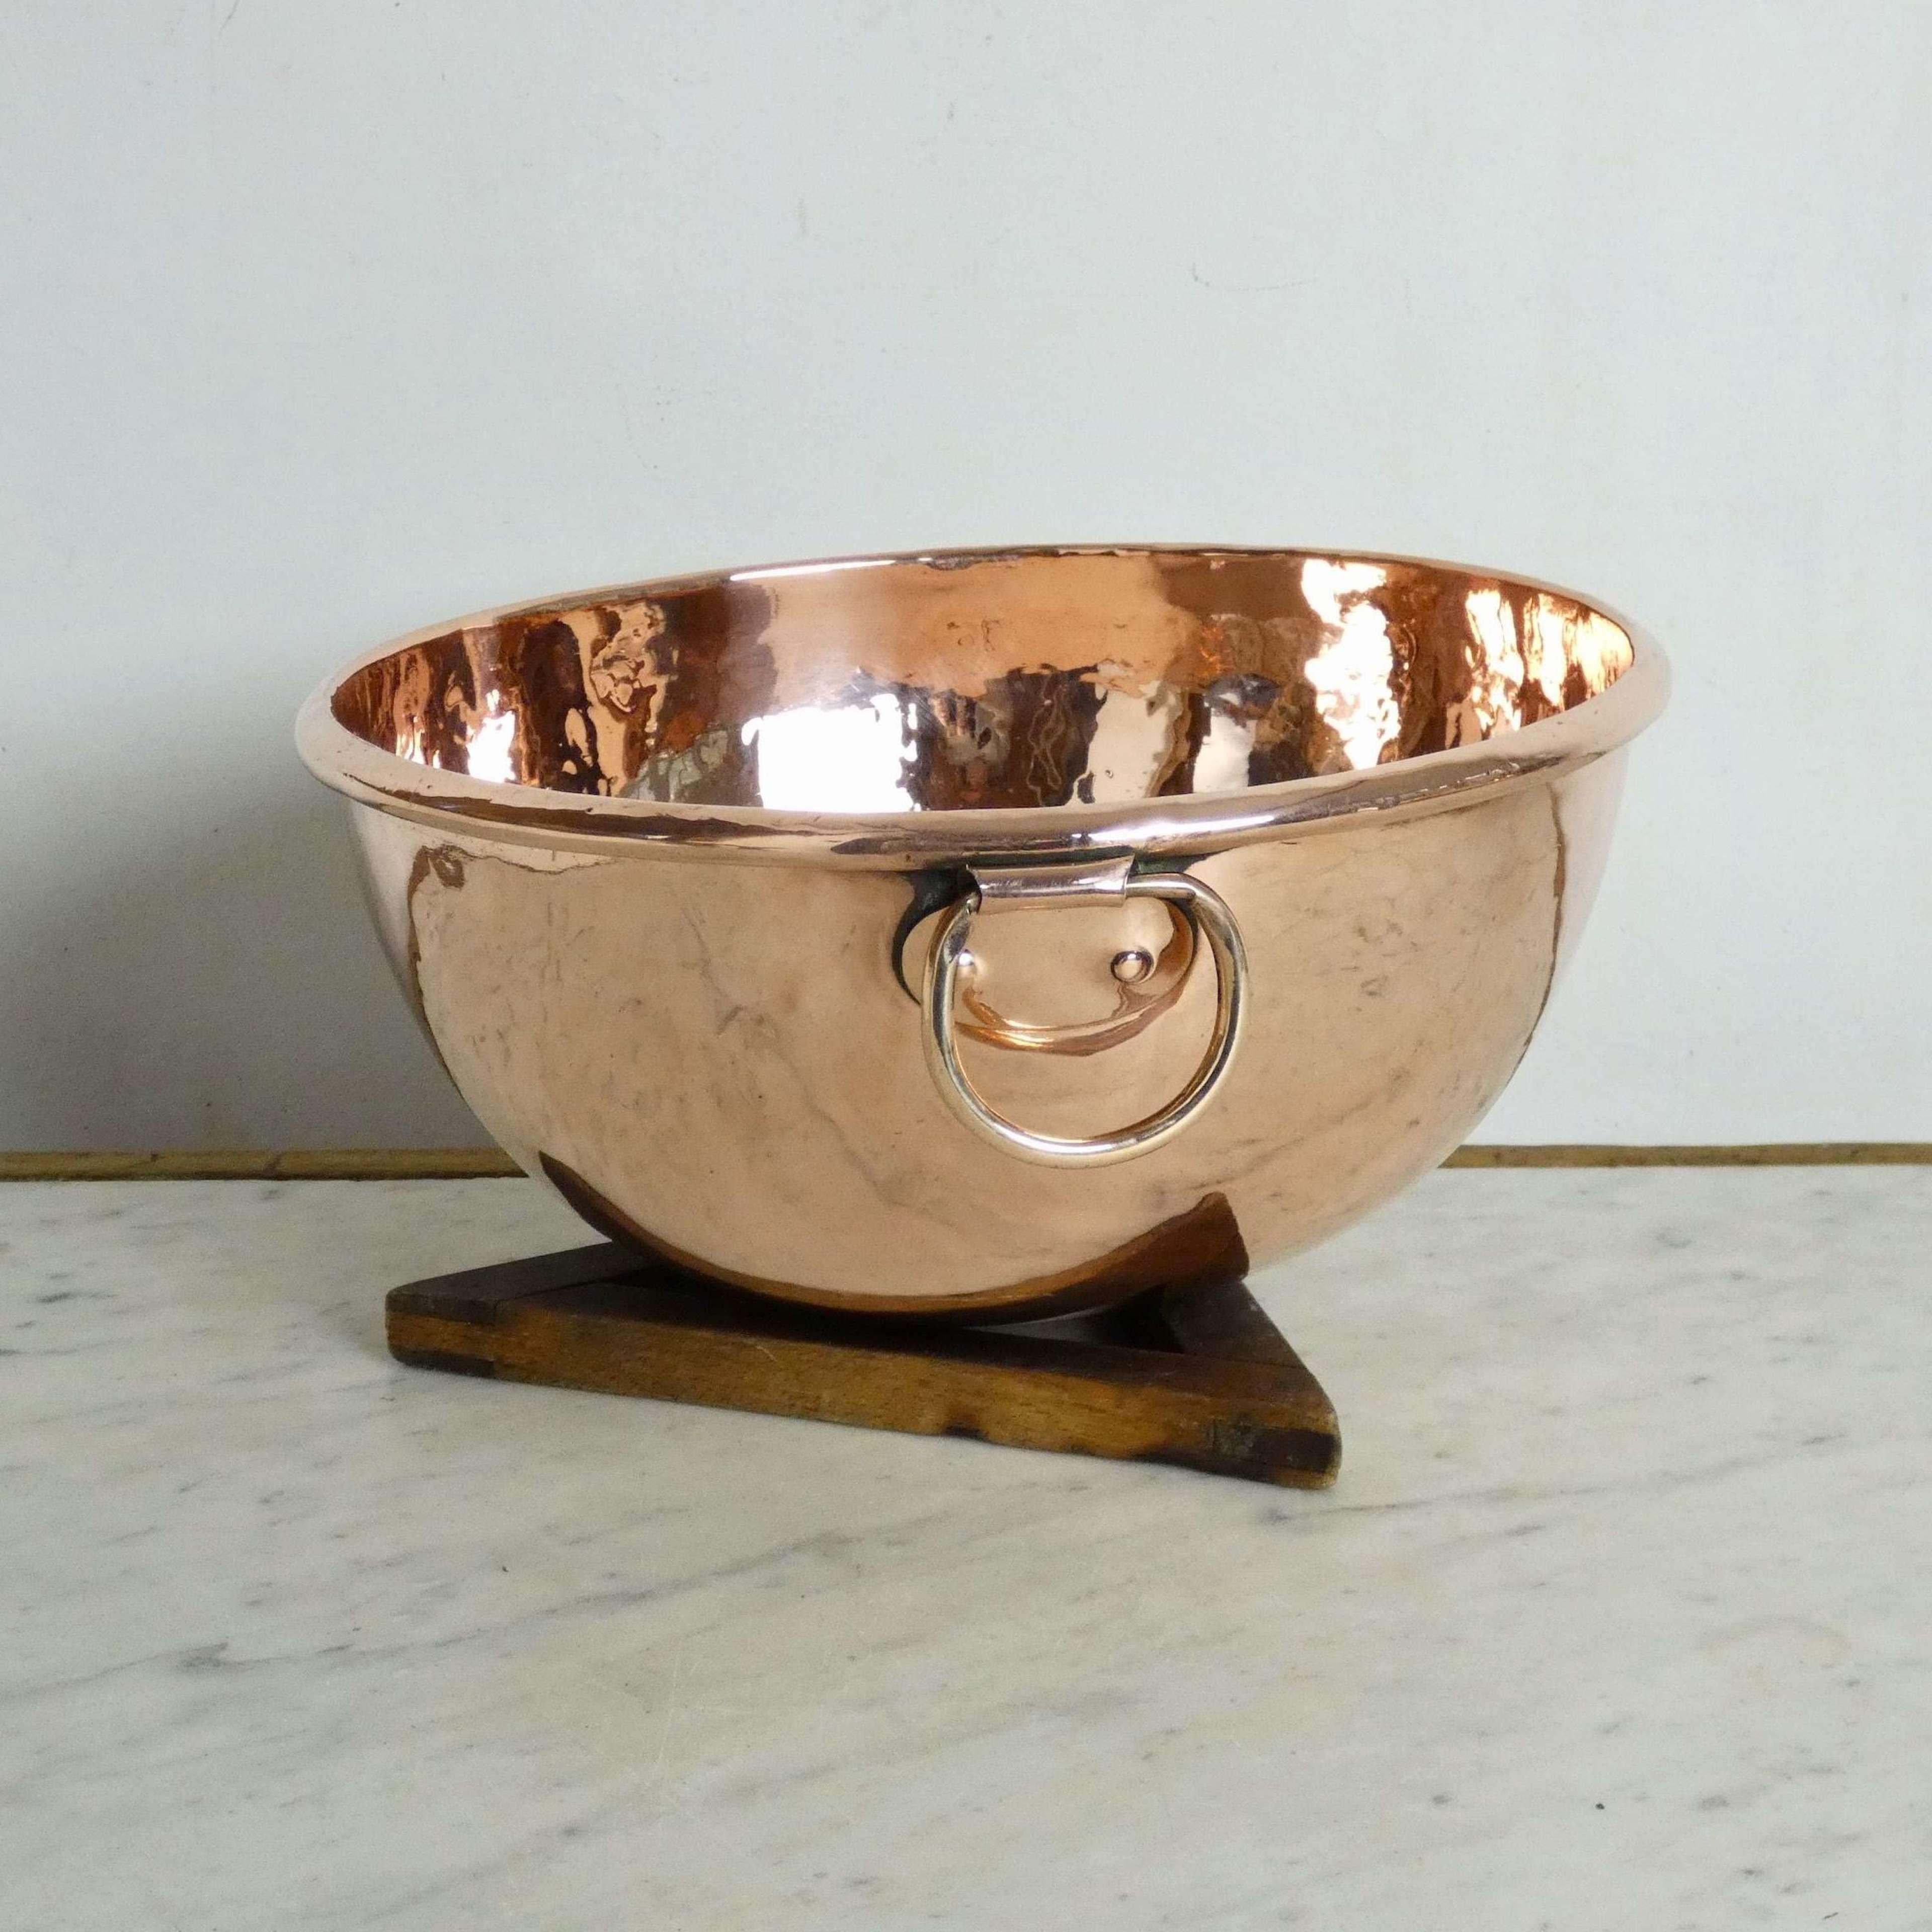 English Copper Egg Bowl